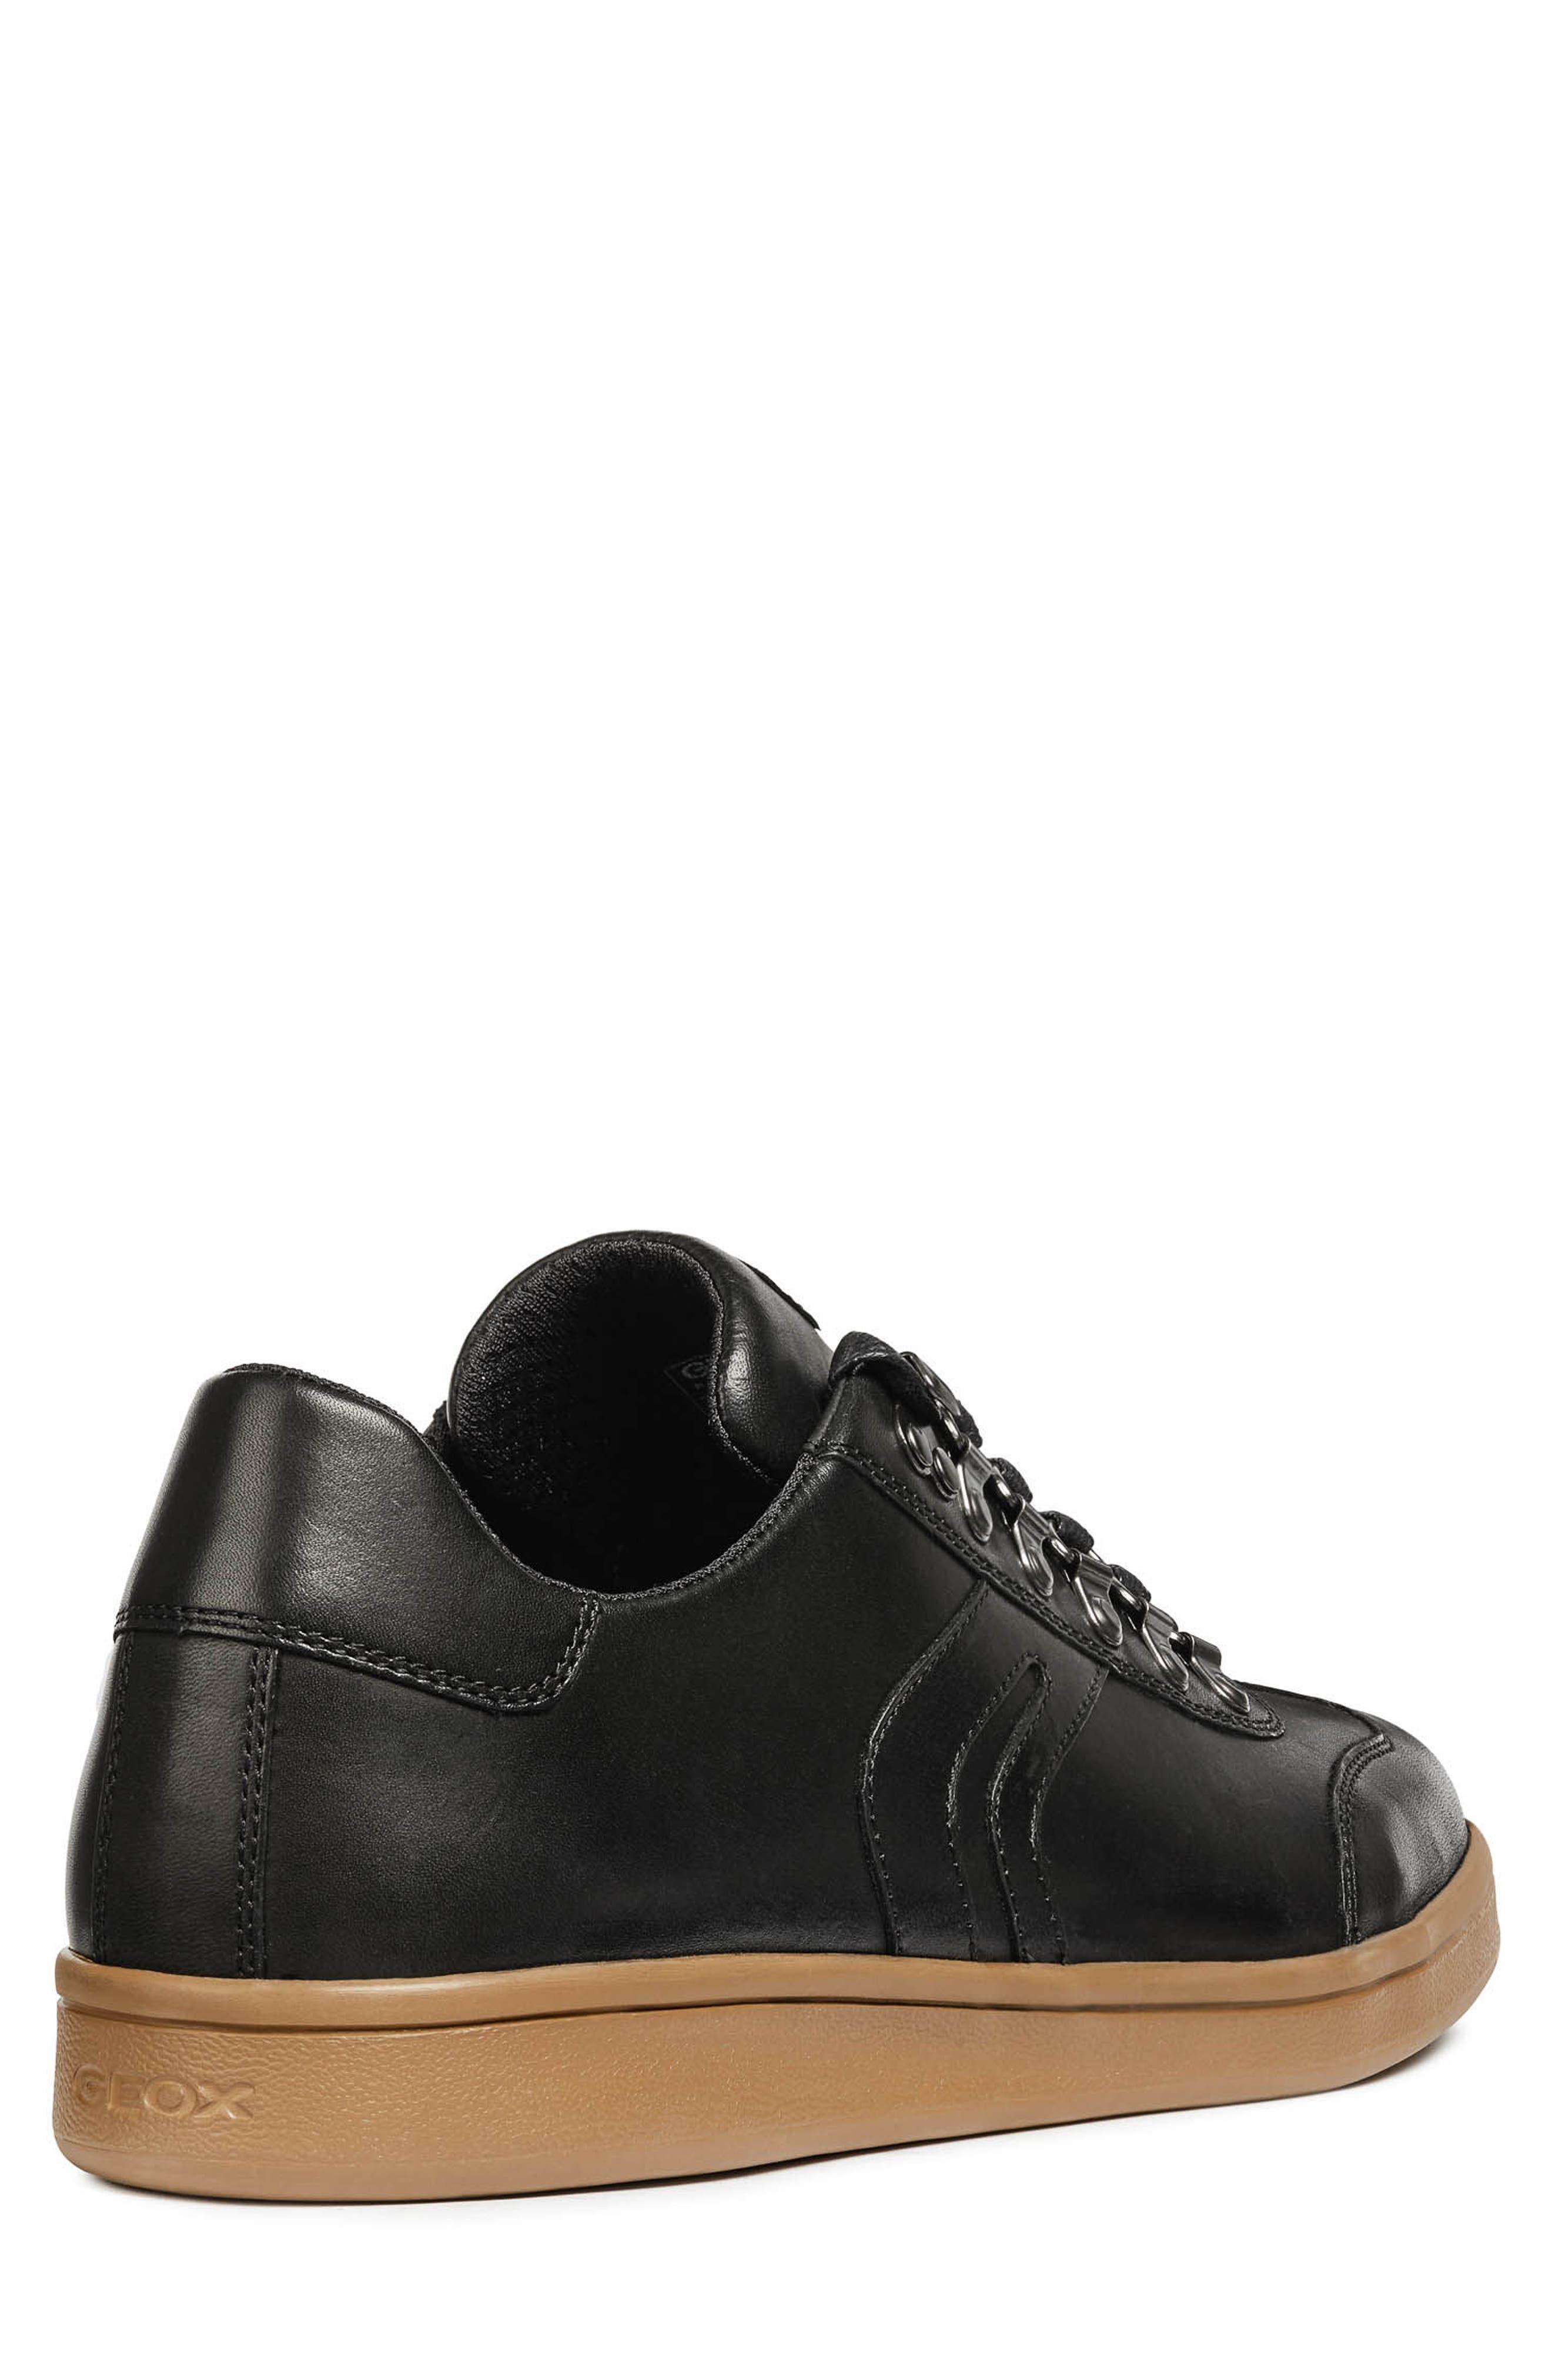 Warrens 12 Low Top Sneaker,                             Alternate thumbnail 2, color,                             BLACK LEATHER